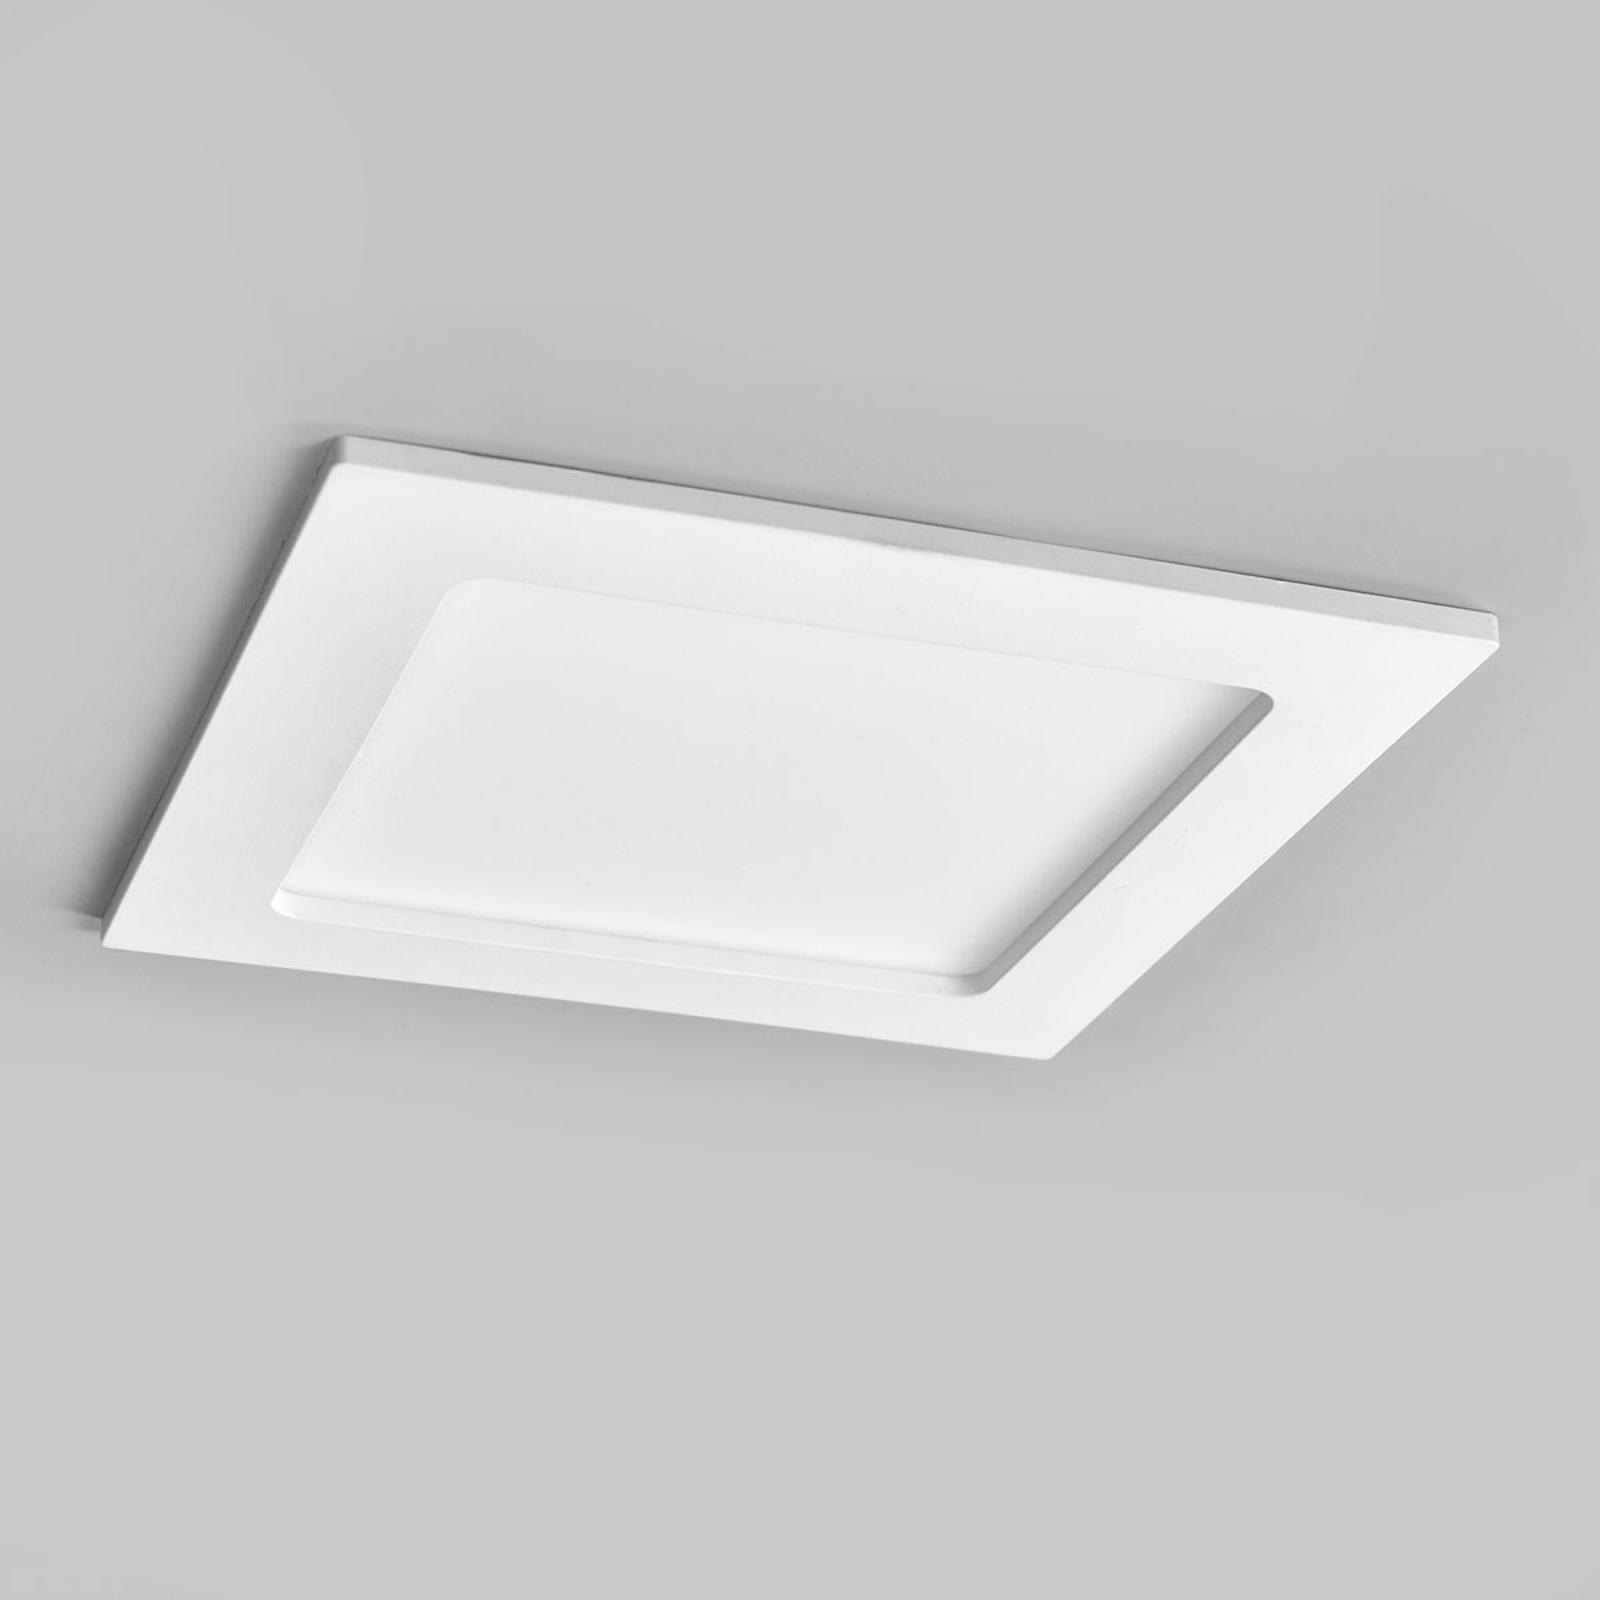 LED-indbygningsspot Joki hvid 4000K kantet 16,5cm